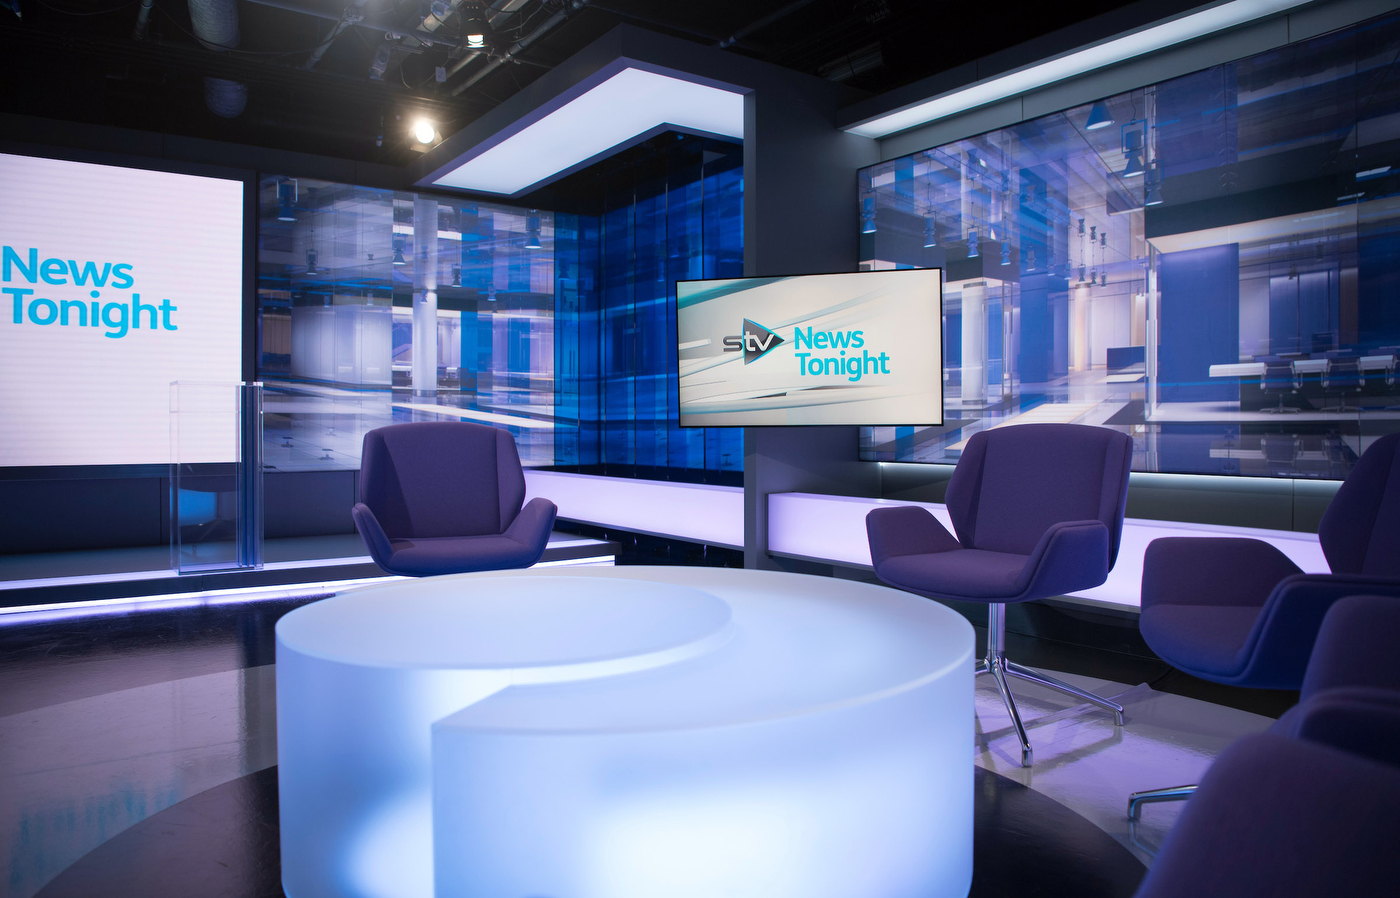 NCS_STV-News_0002